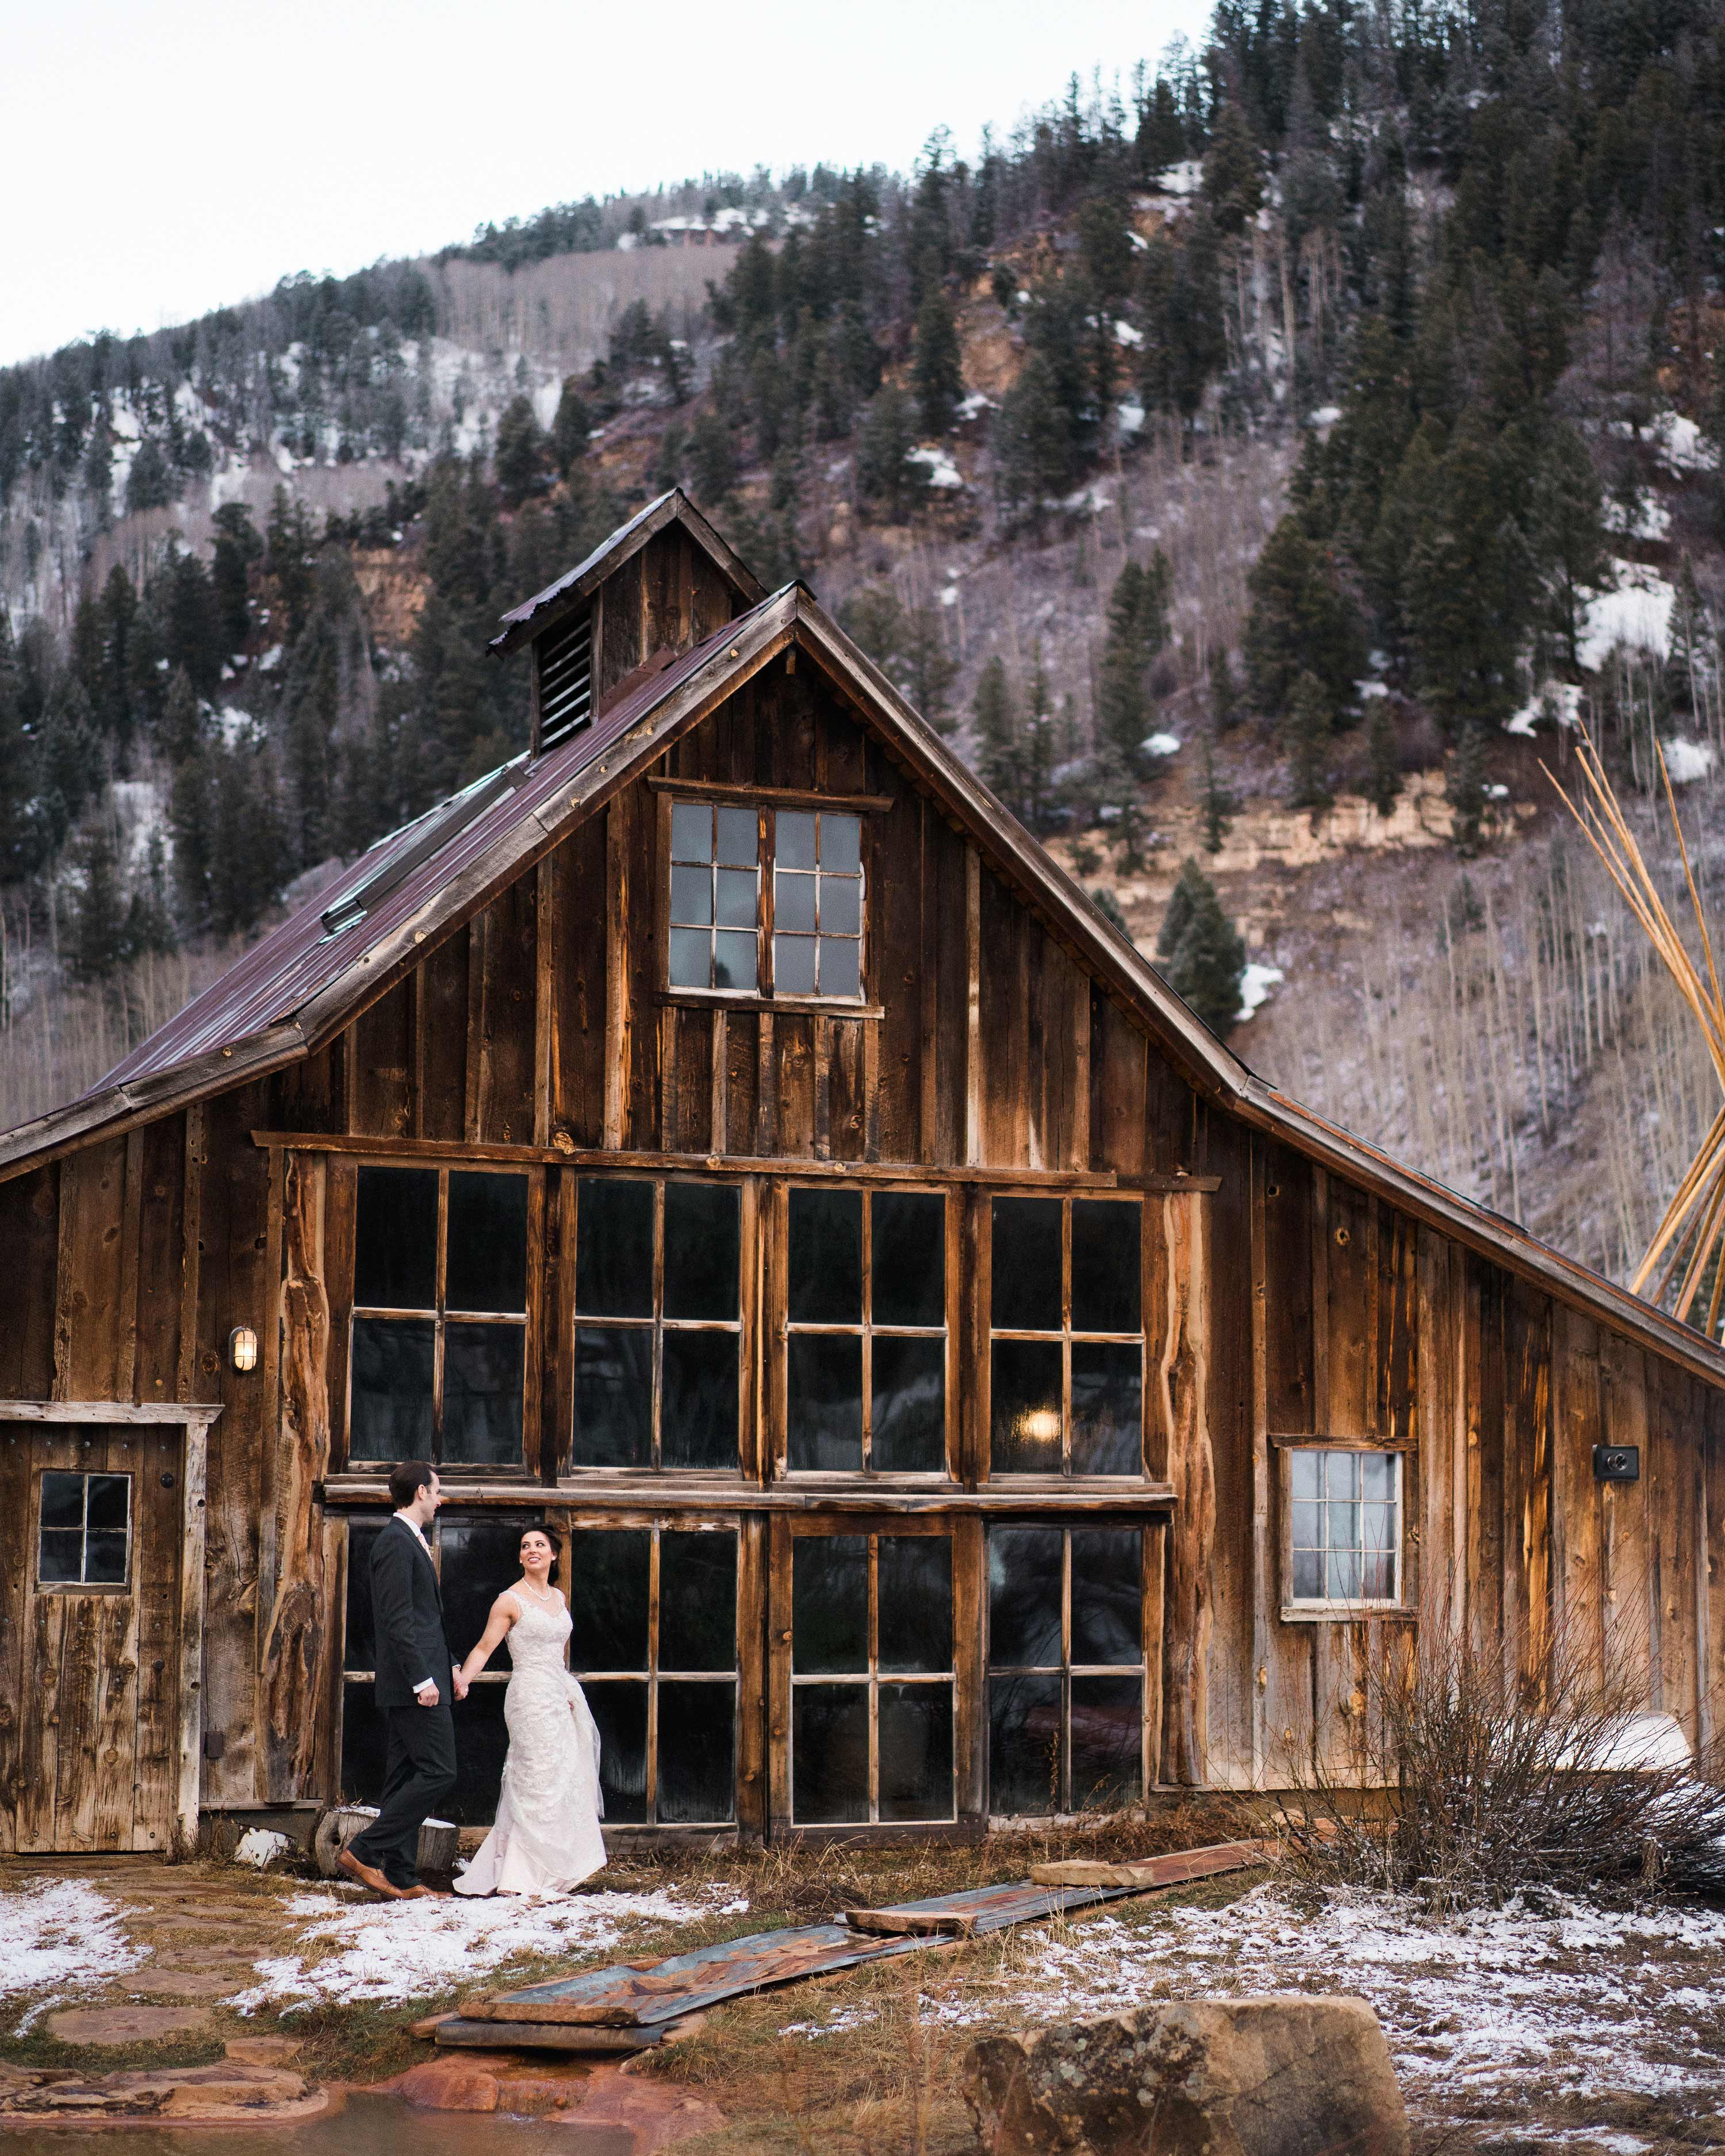 meshach-warren-wedding-couple-0693-6134942-0716.jpg